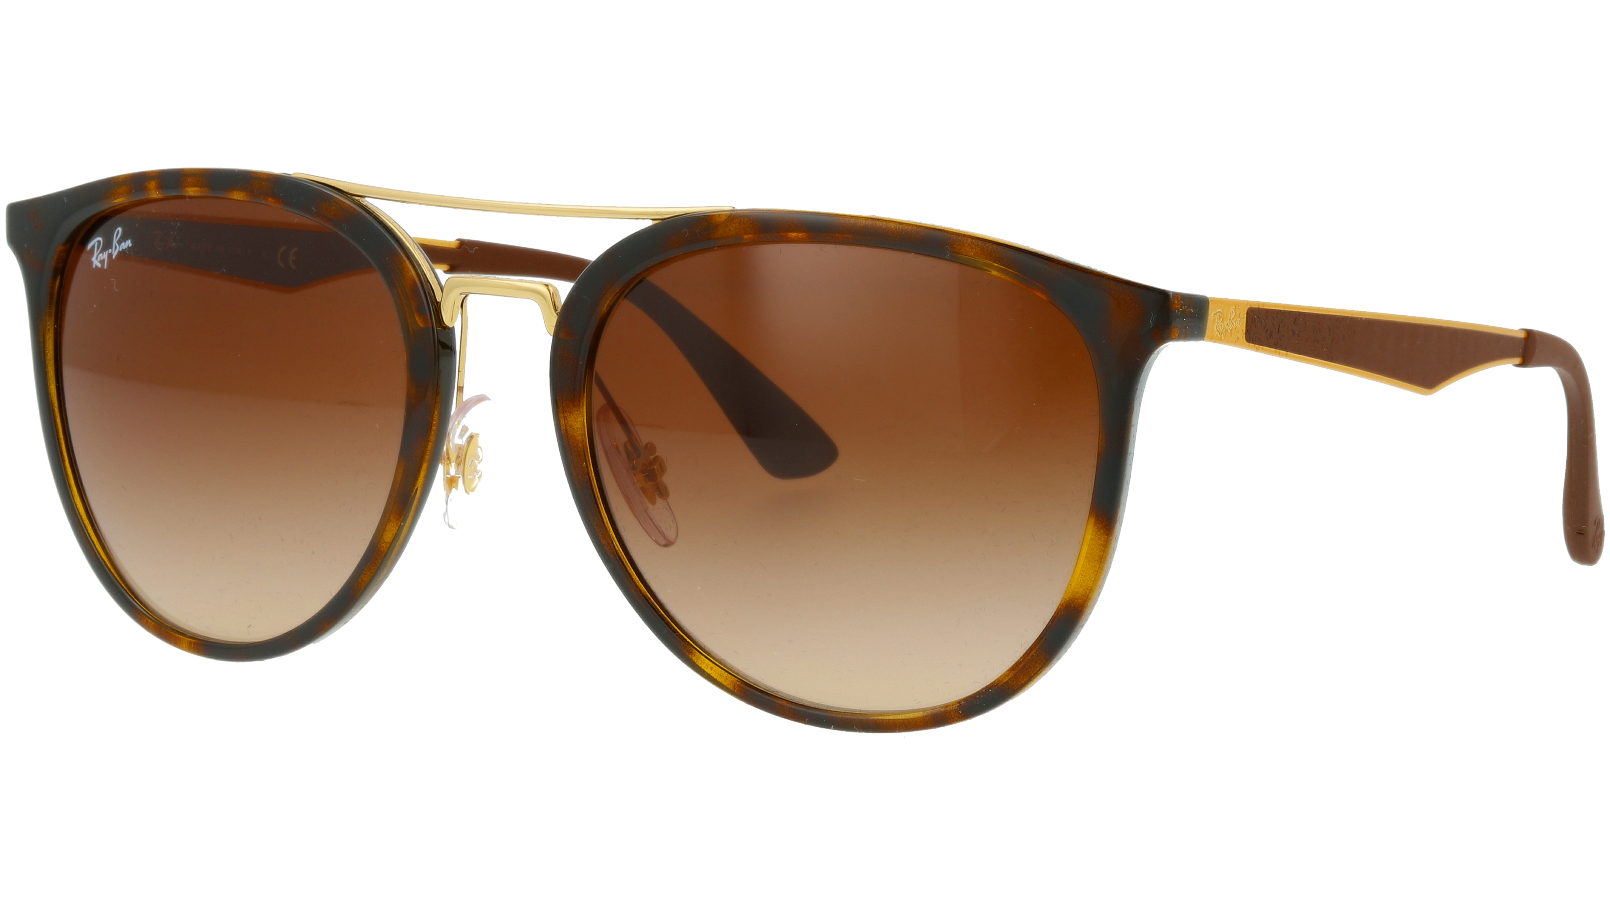 Ray-Ban RB4285 710/13 55 LIGHT Sunglasses